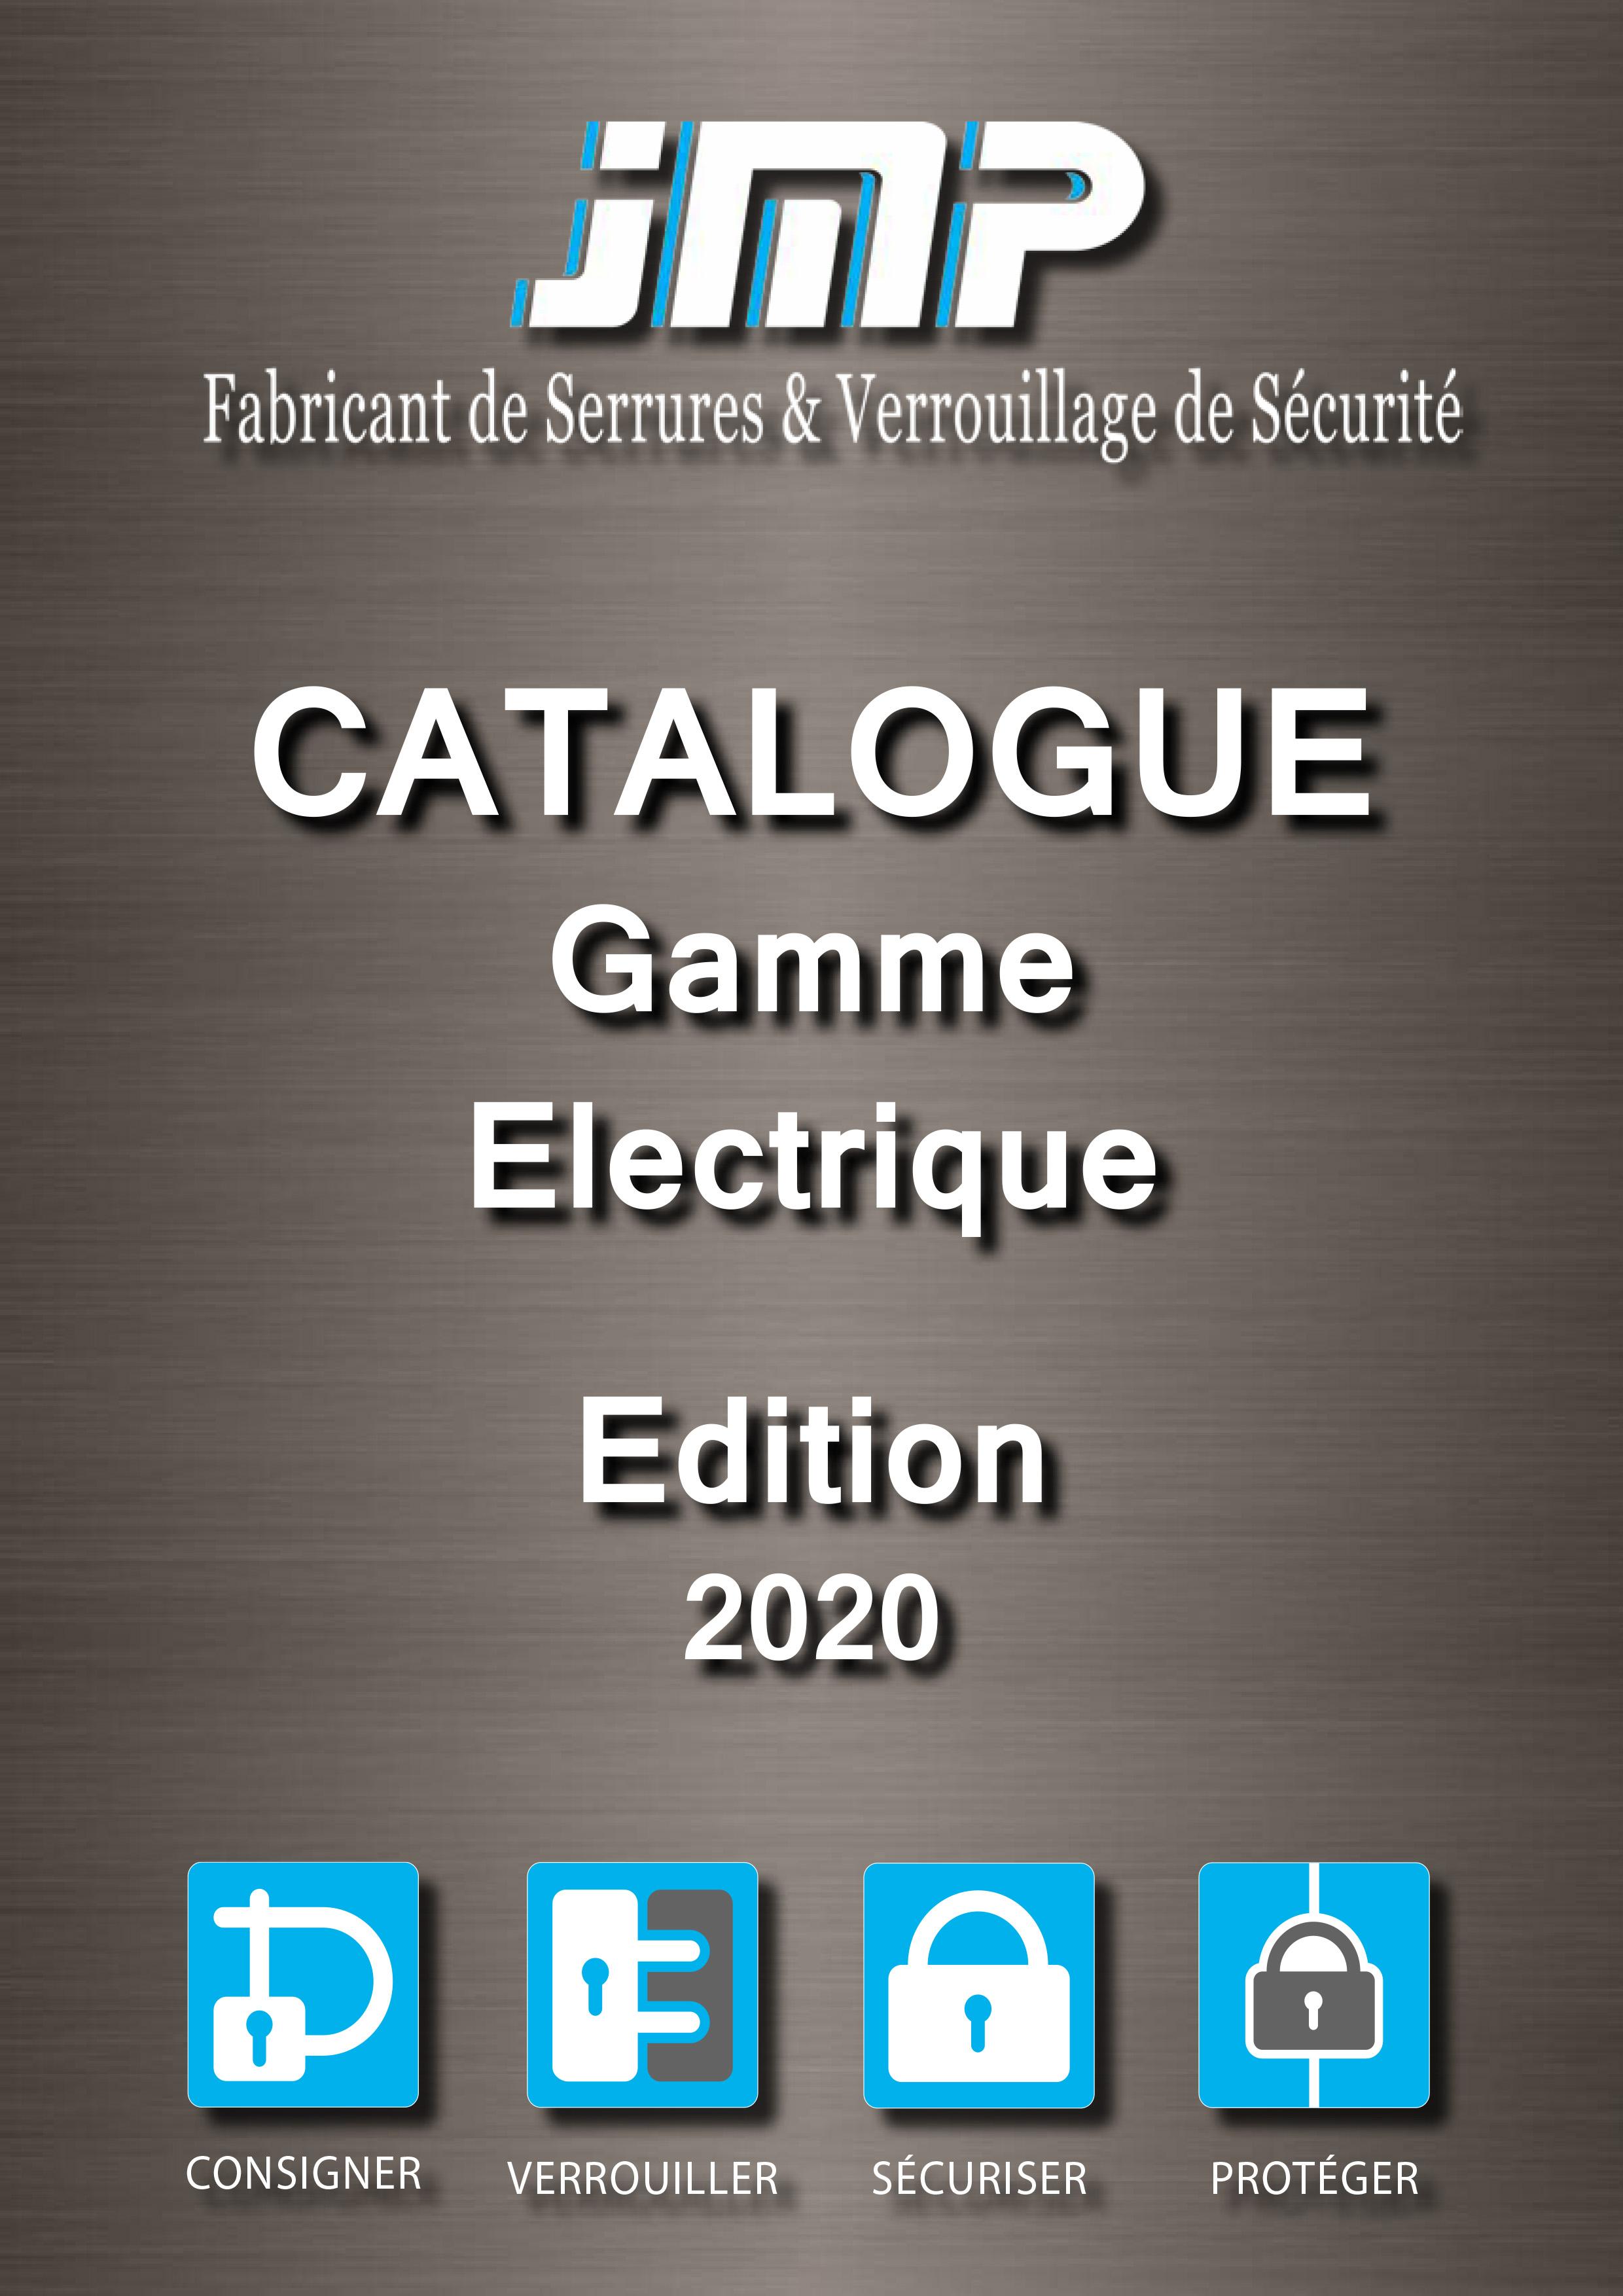 CATALOGUE GAMME ELECTRIQUE JMP 2020 Page de Garde.jpg